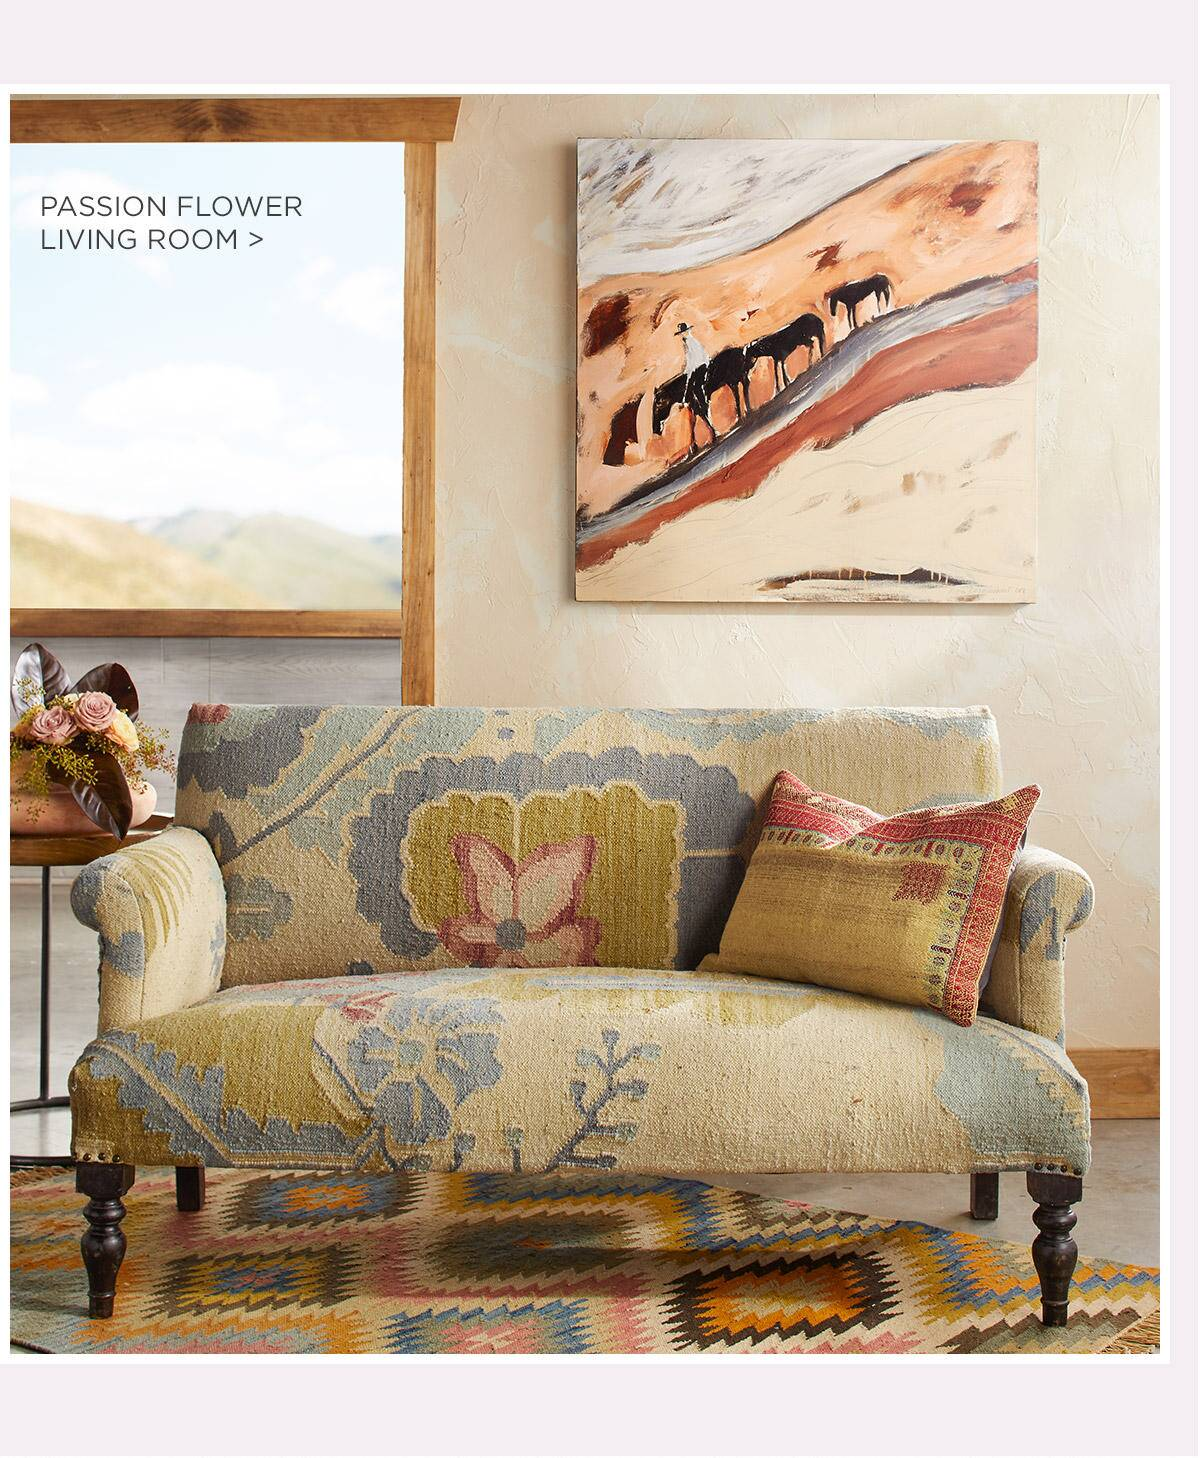 Passion Flower Living Room